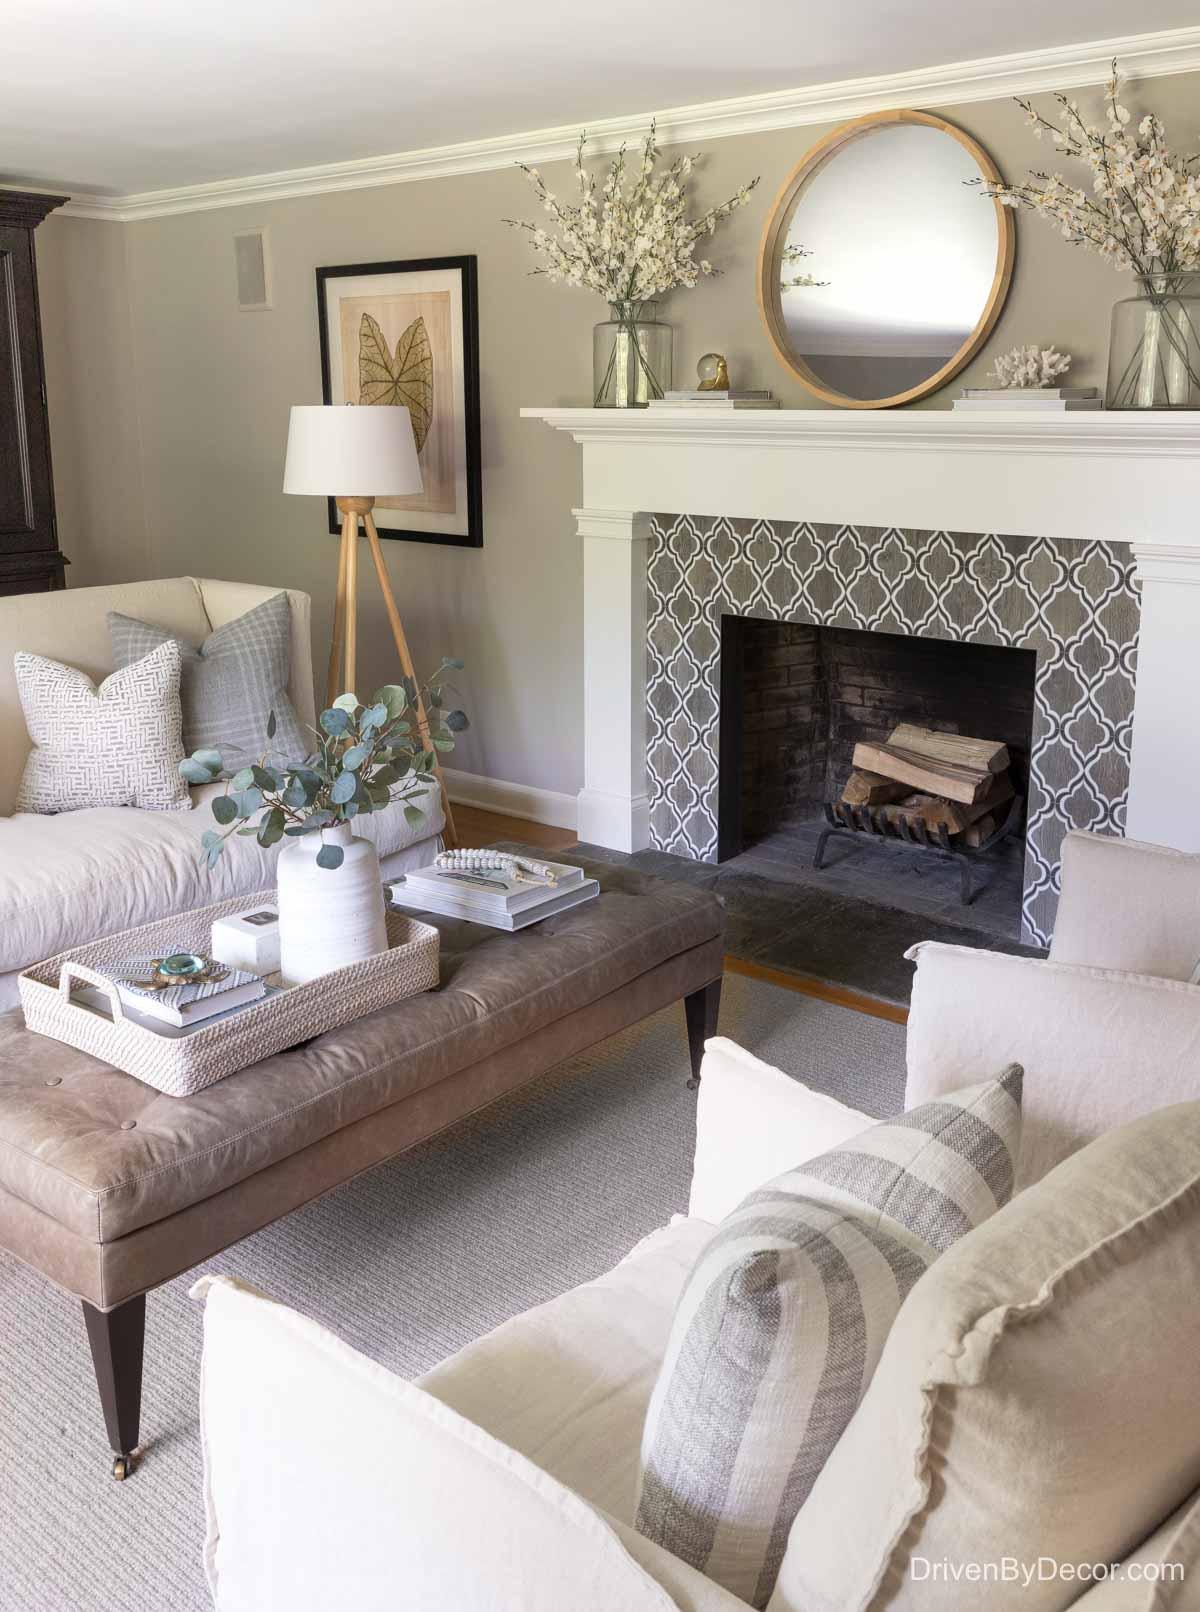 Home remodel: Our living room after remodeling!